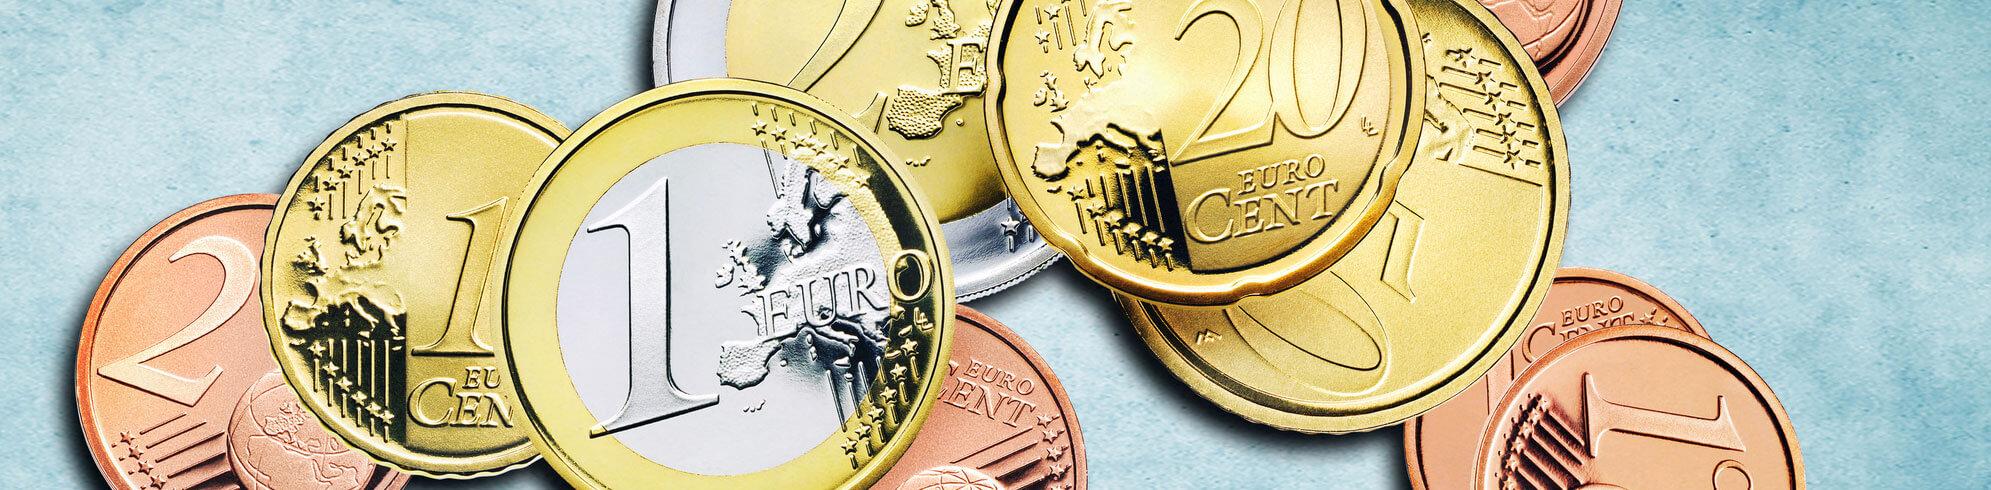 5 euro einzahlen casino 2020